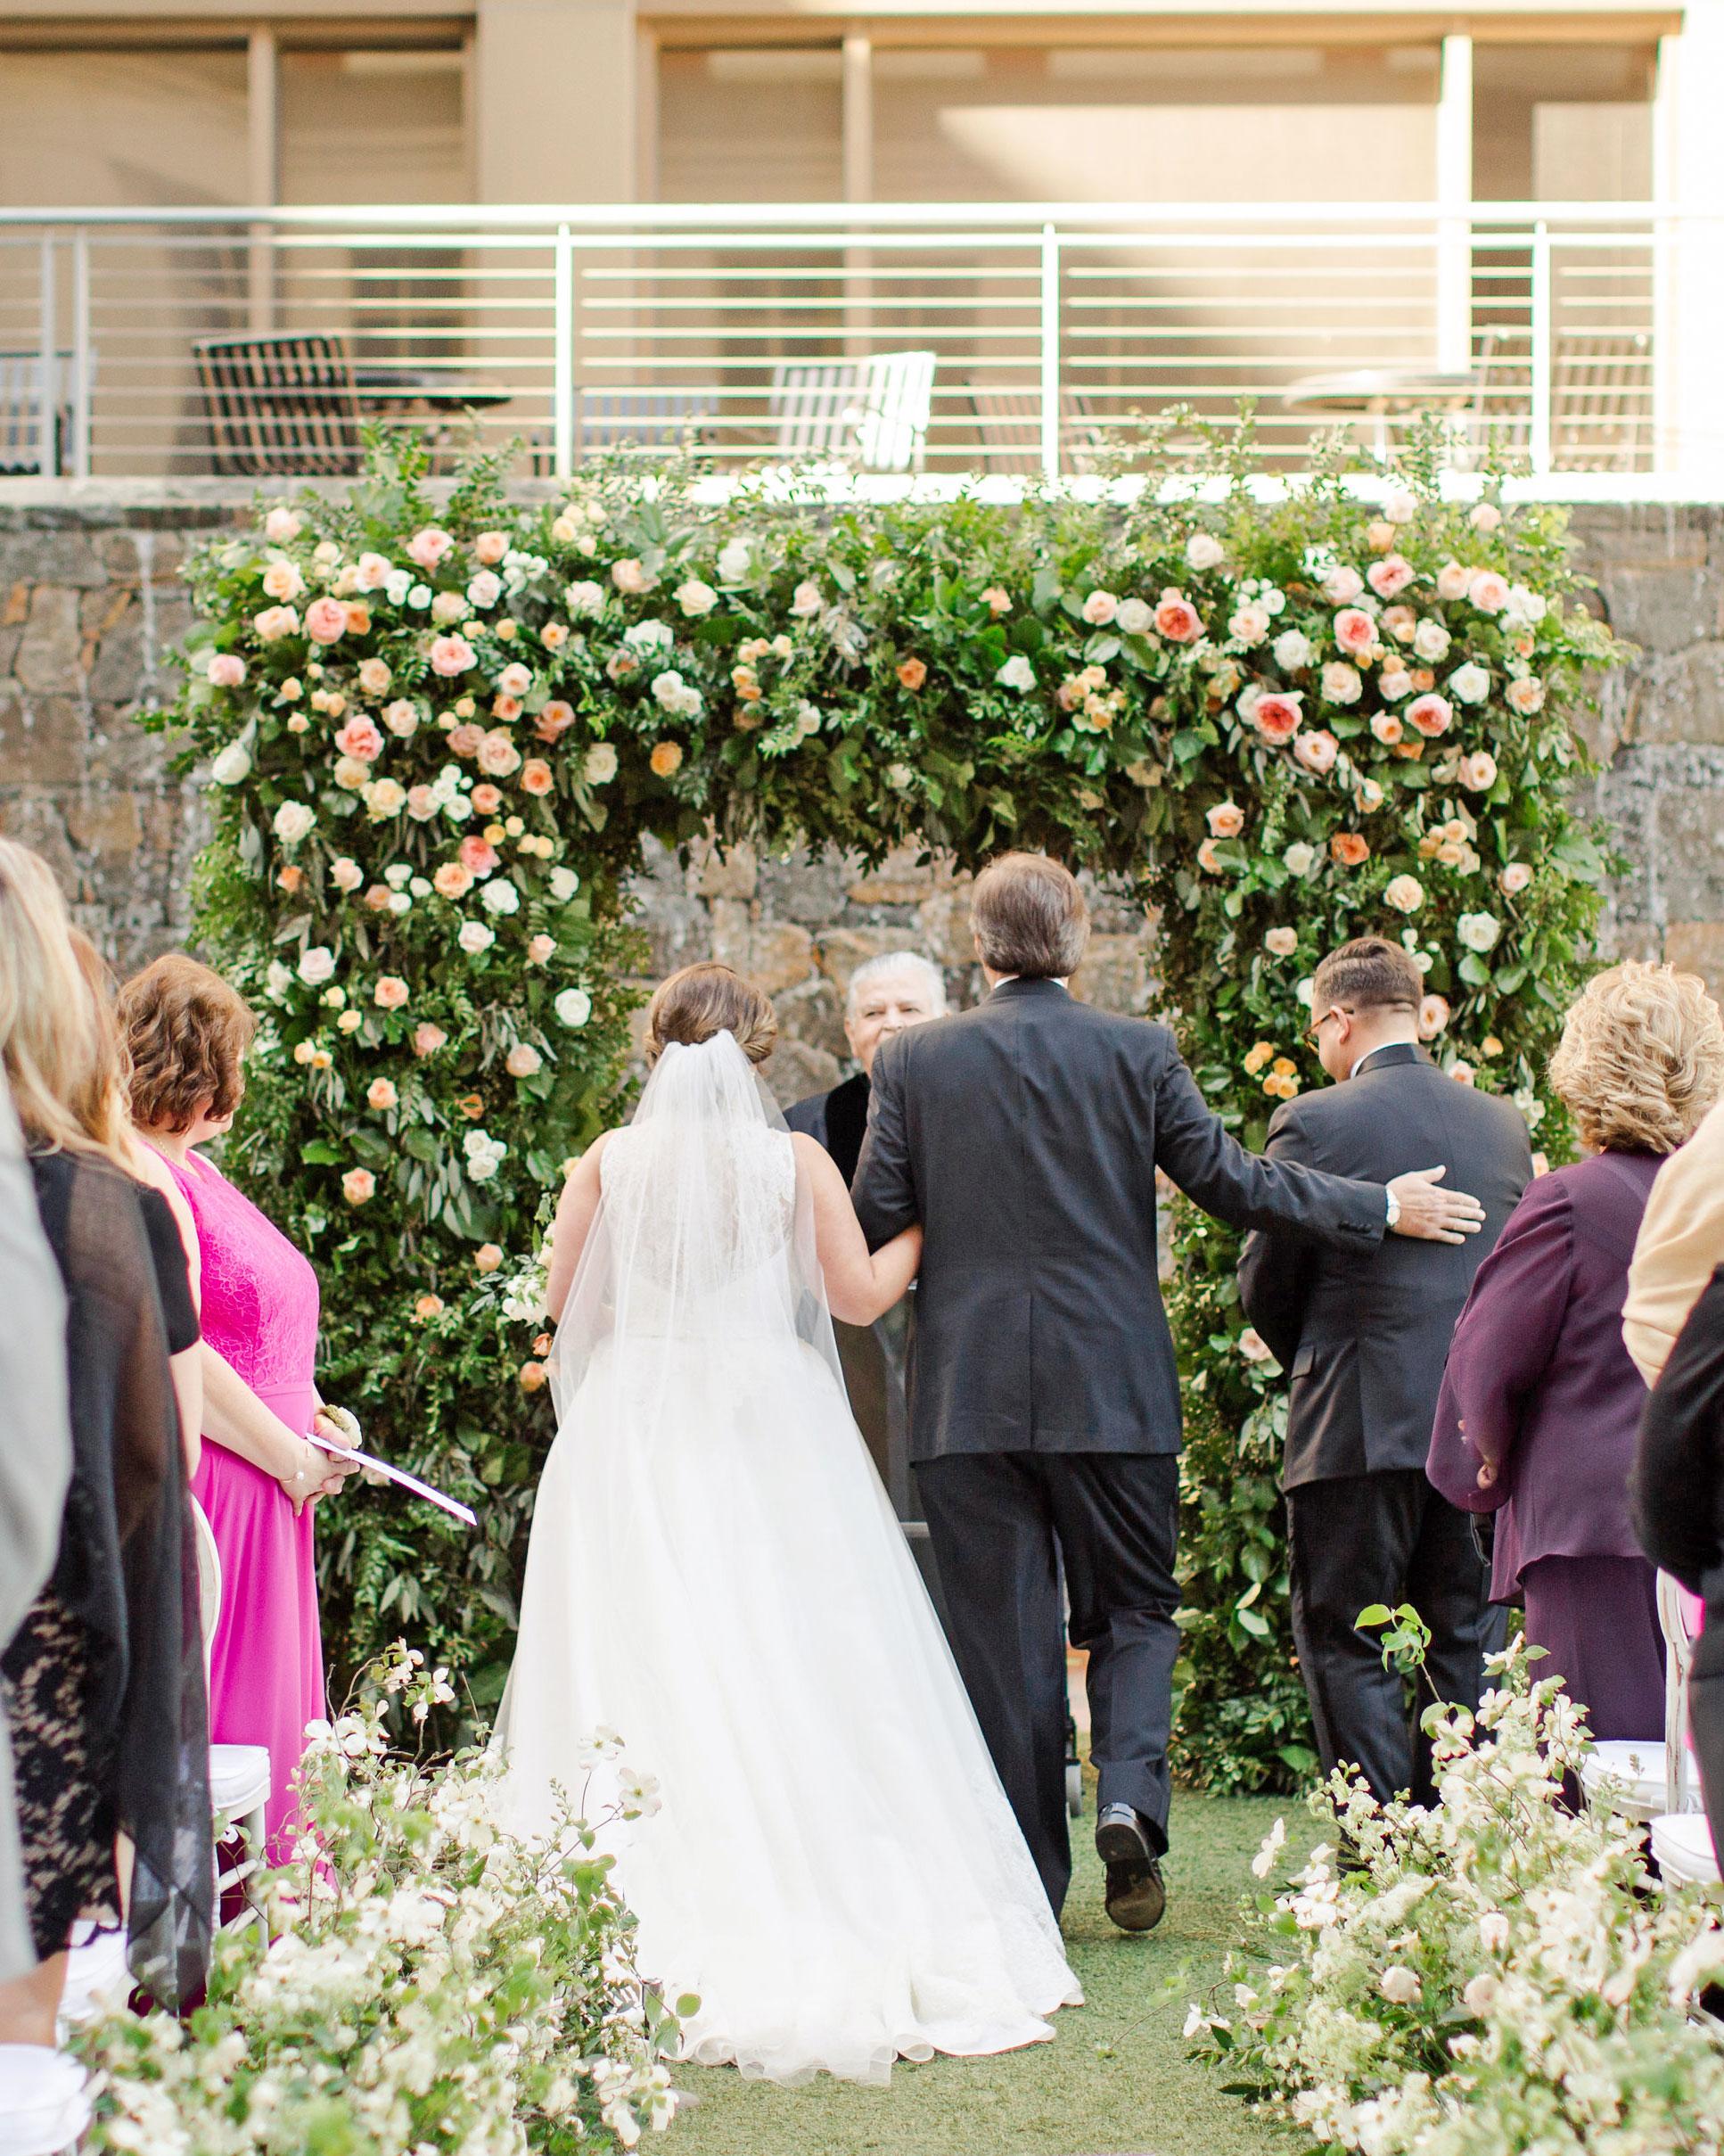 carey jared wedding ceremony